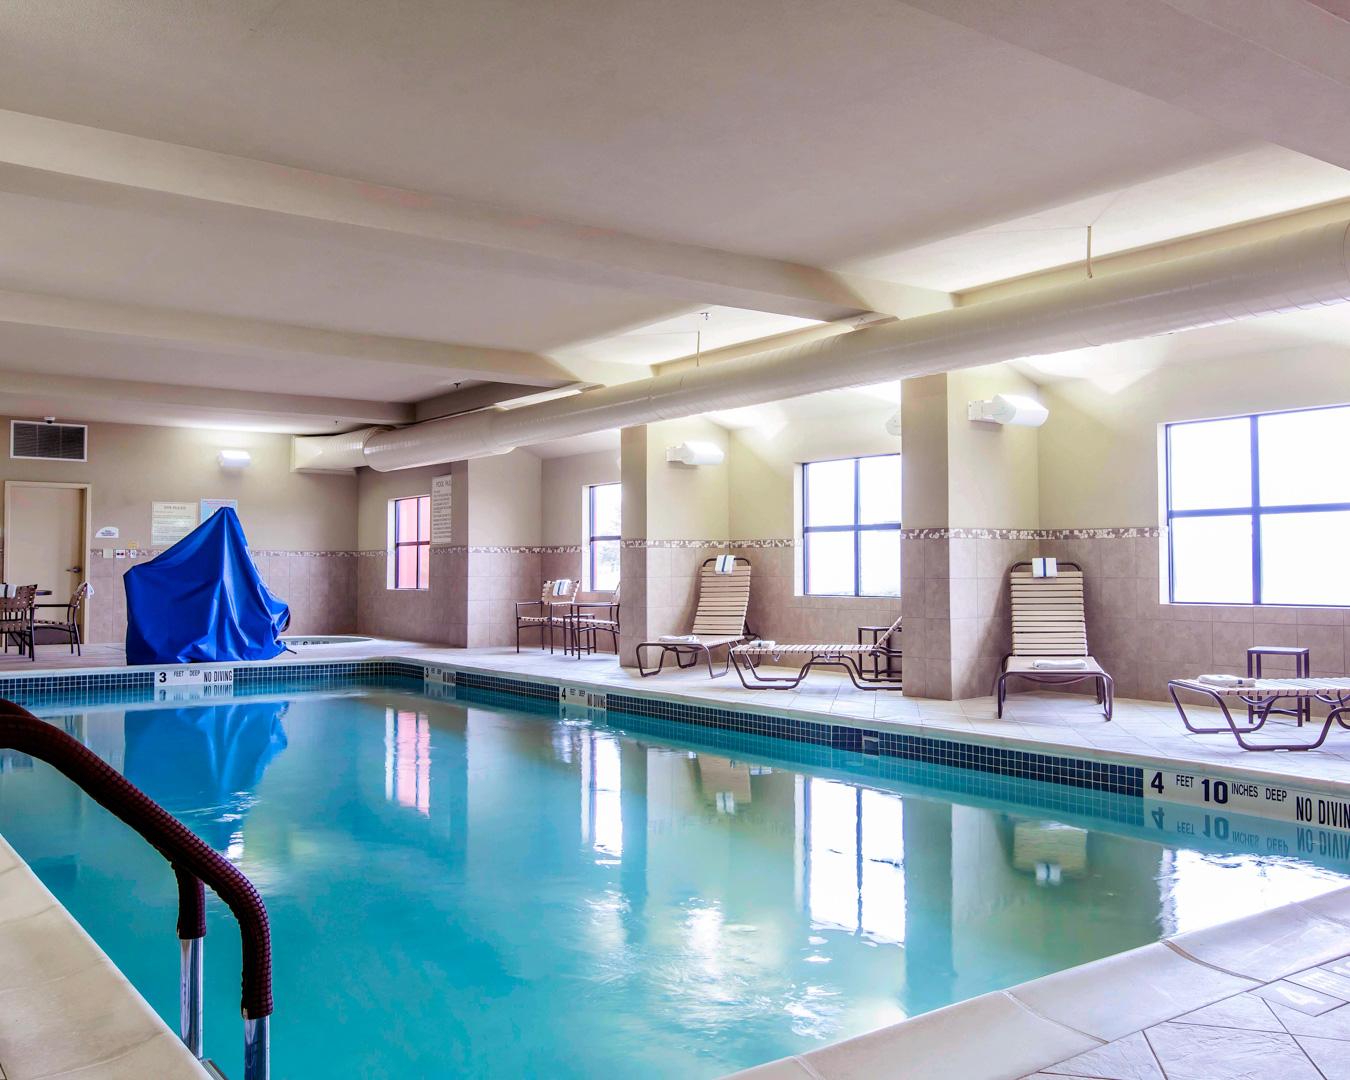 Comfort Inn & Suites Adj To Akwesasne Mohawk Casino, Hogansburg NY